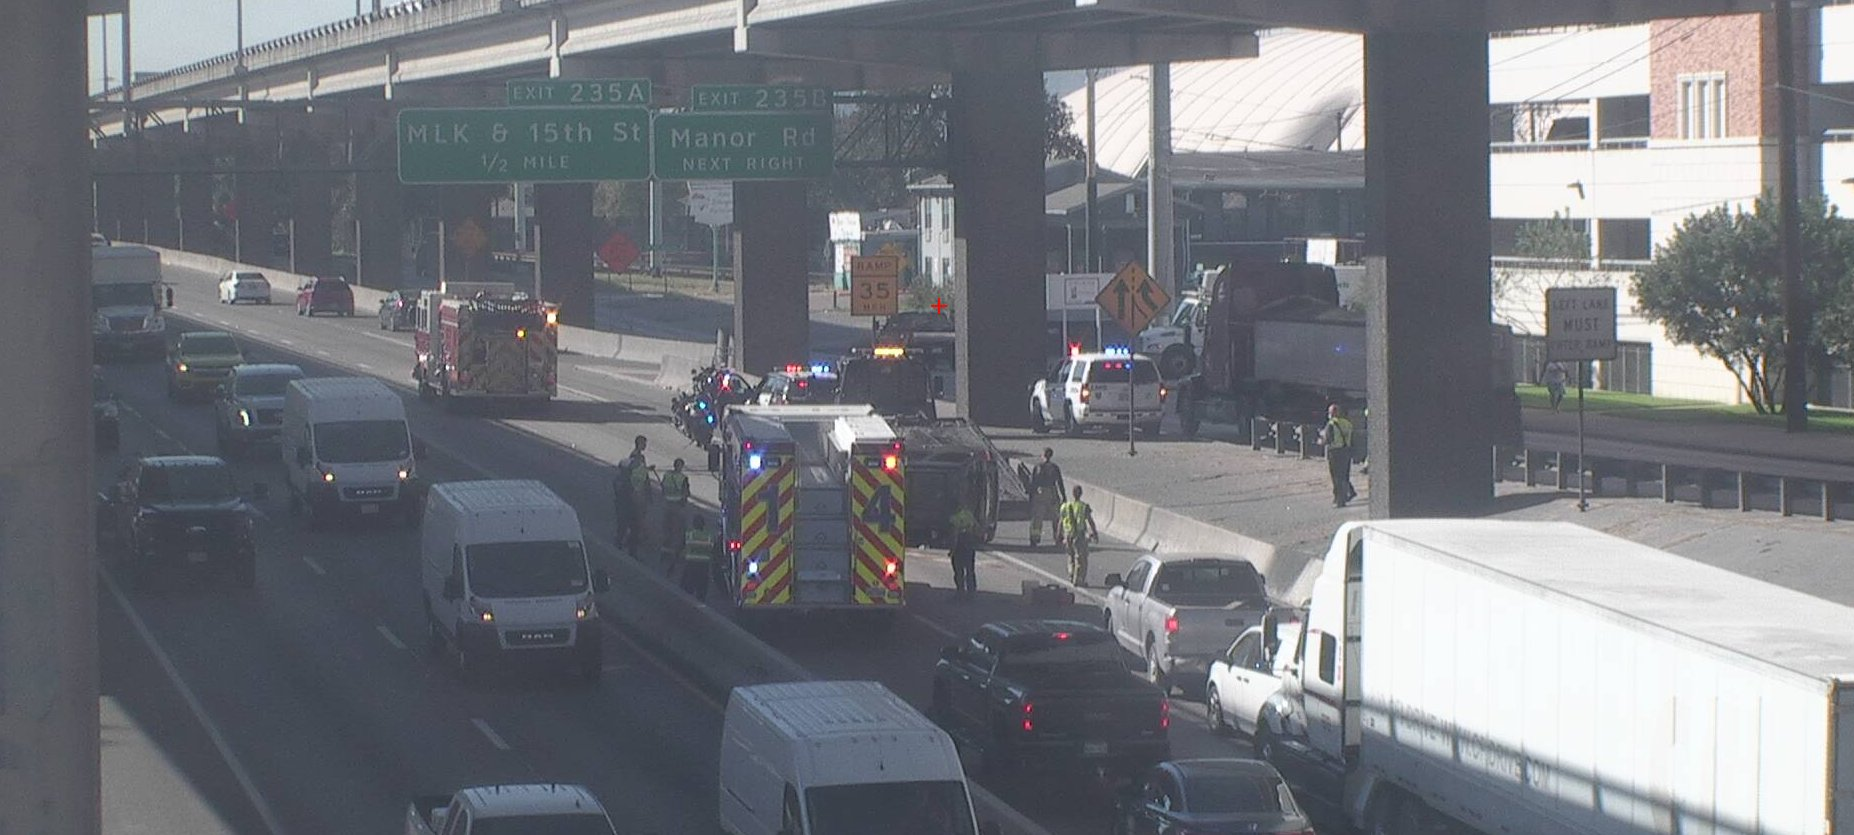 A crash on Interstate 35 near 32nd Street Nov. 18, 2020 (Austin Transportation Department Photo)